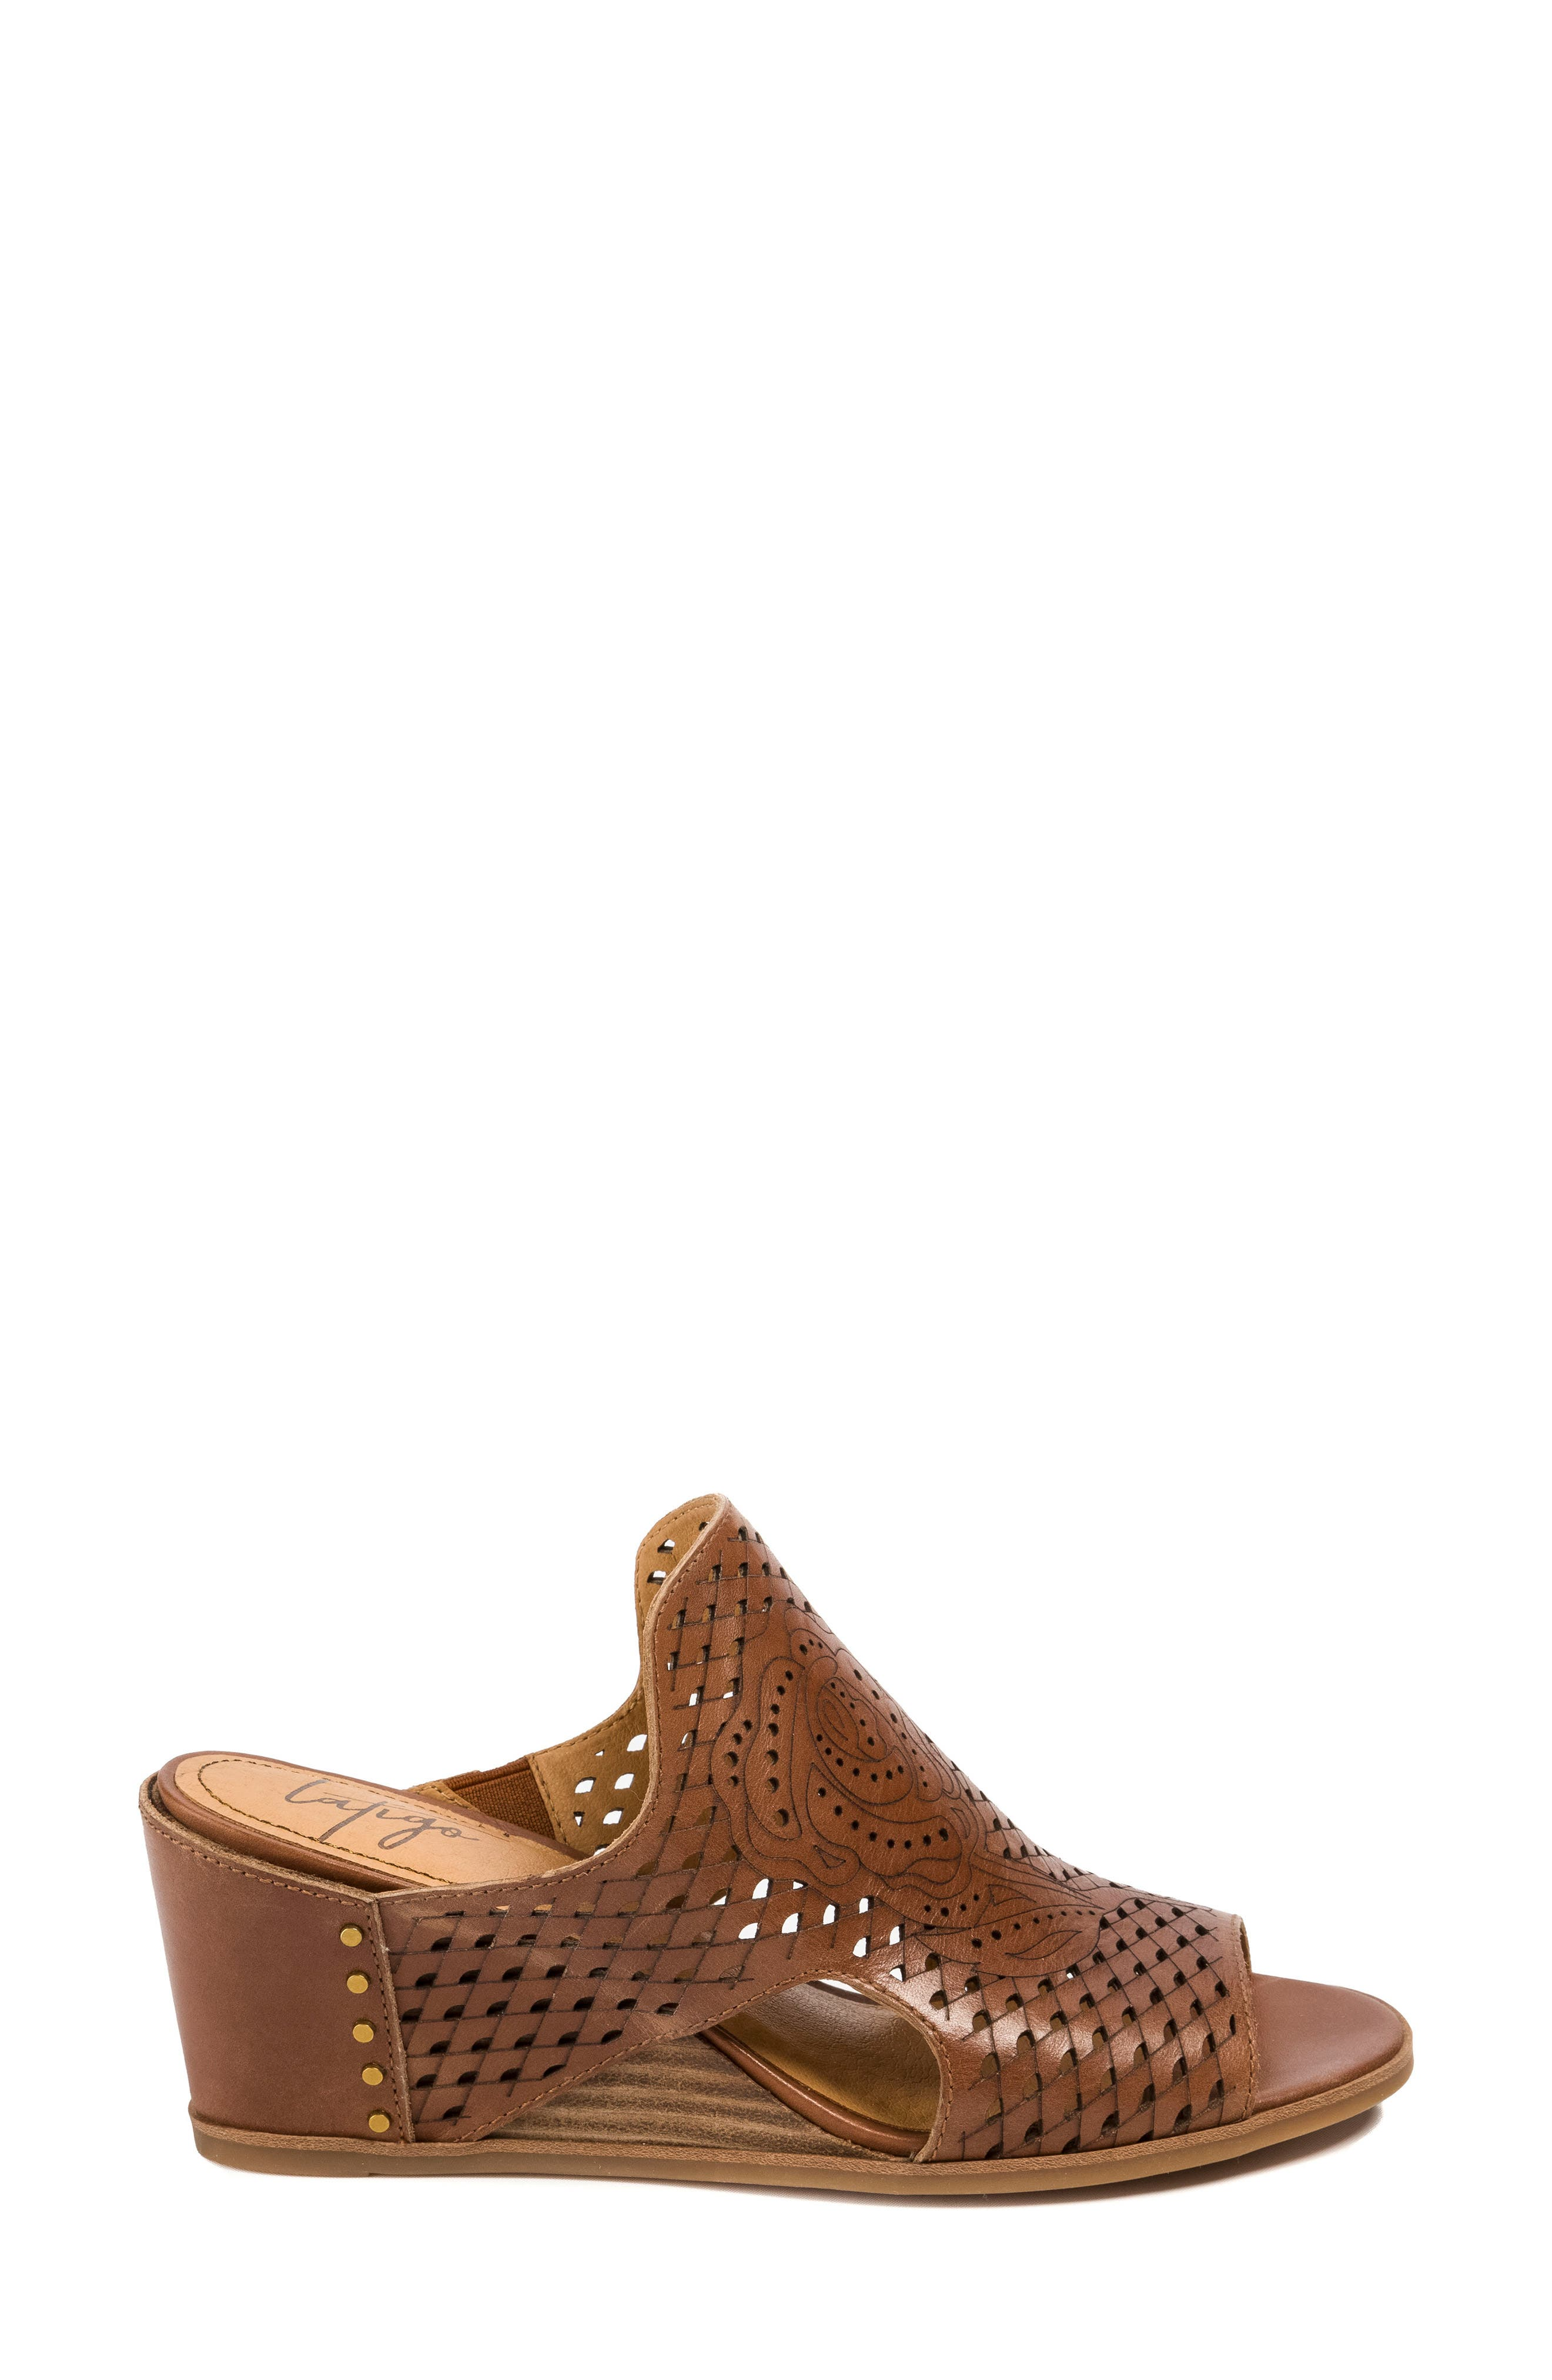 Janis Laser Cut Wedge Sandal,                             Alternate thumbnail 3, color,                             Brush Brown Leather